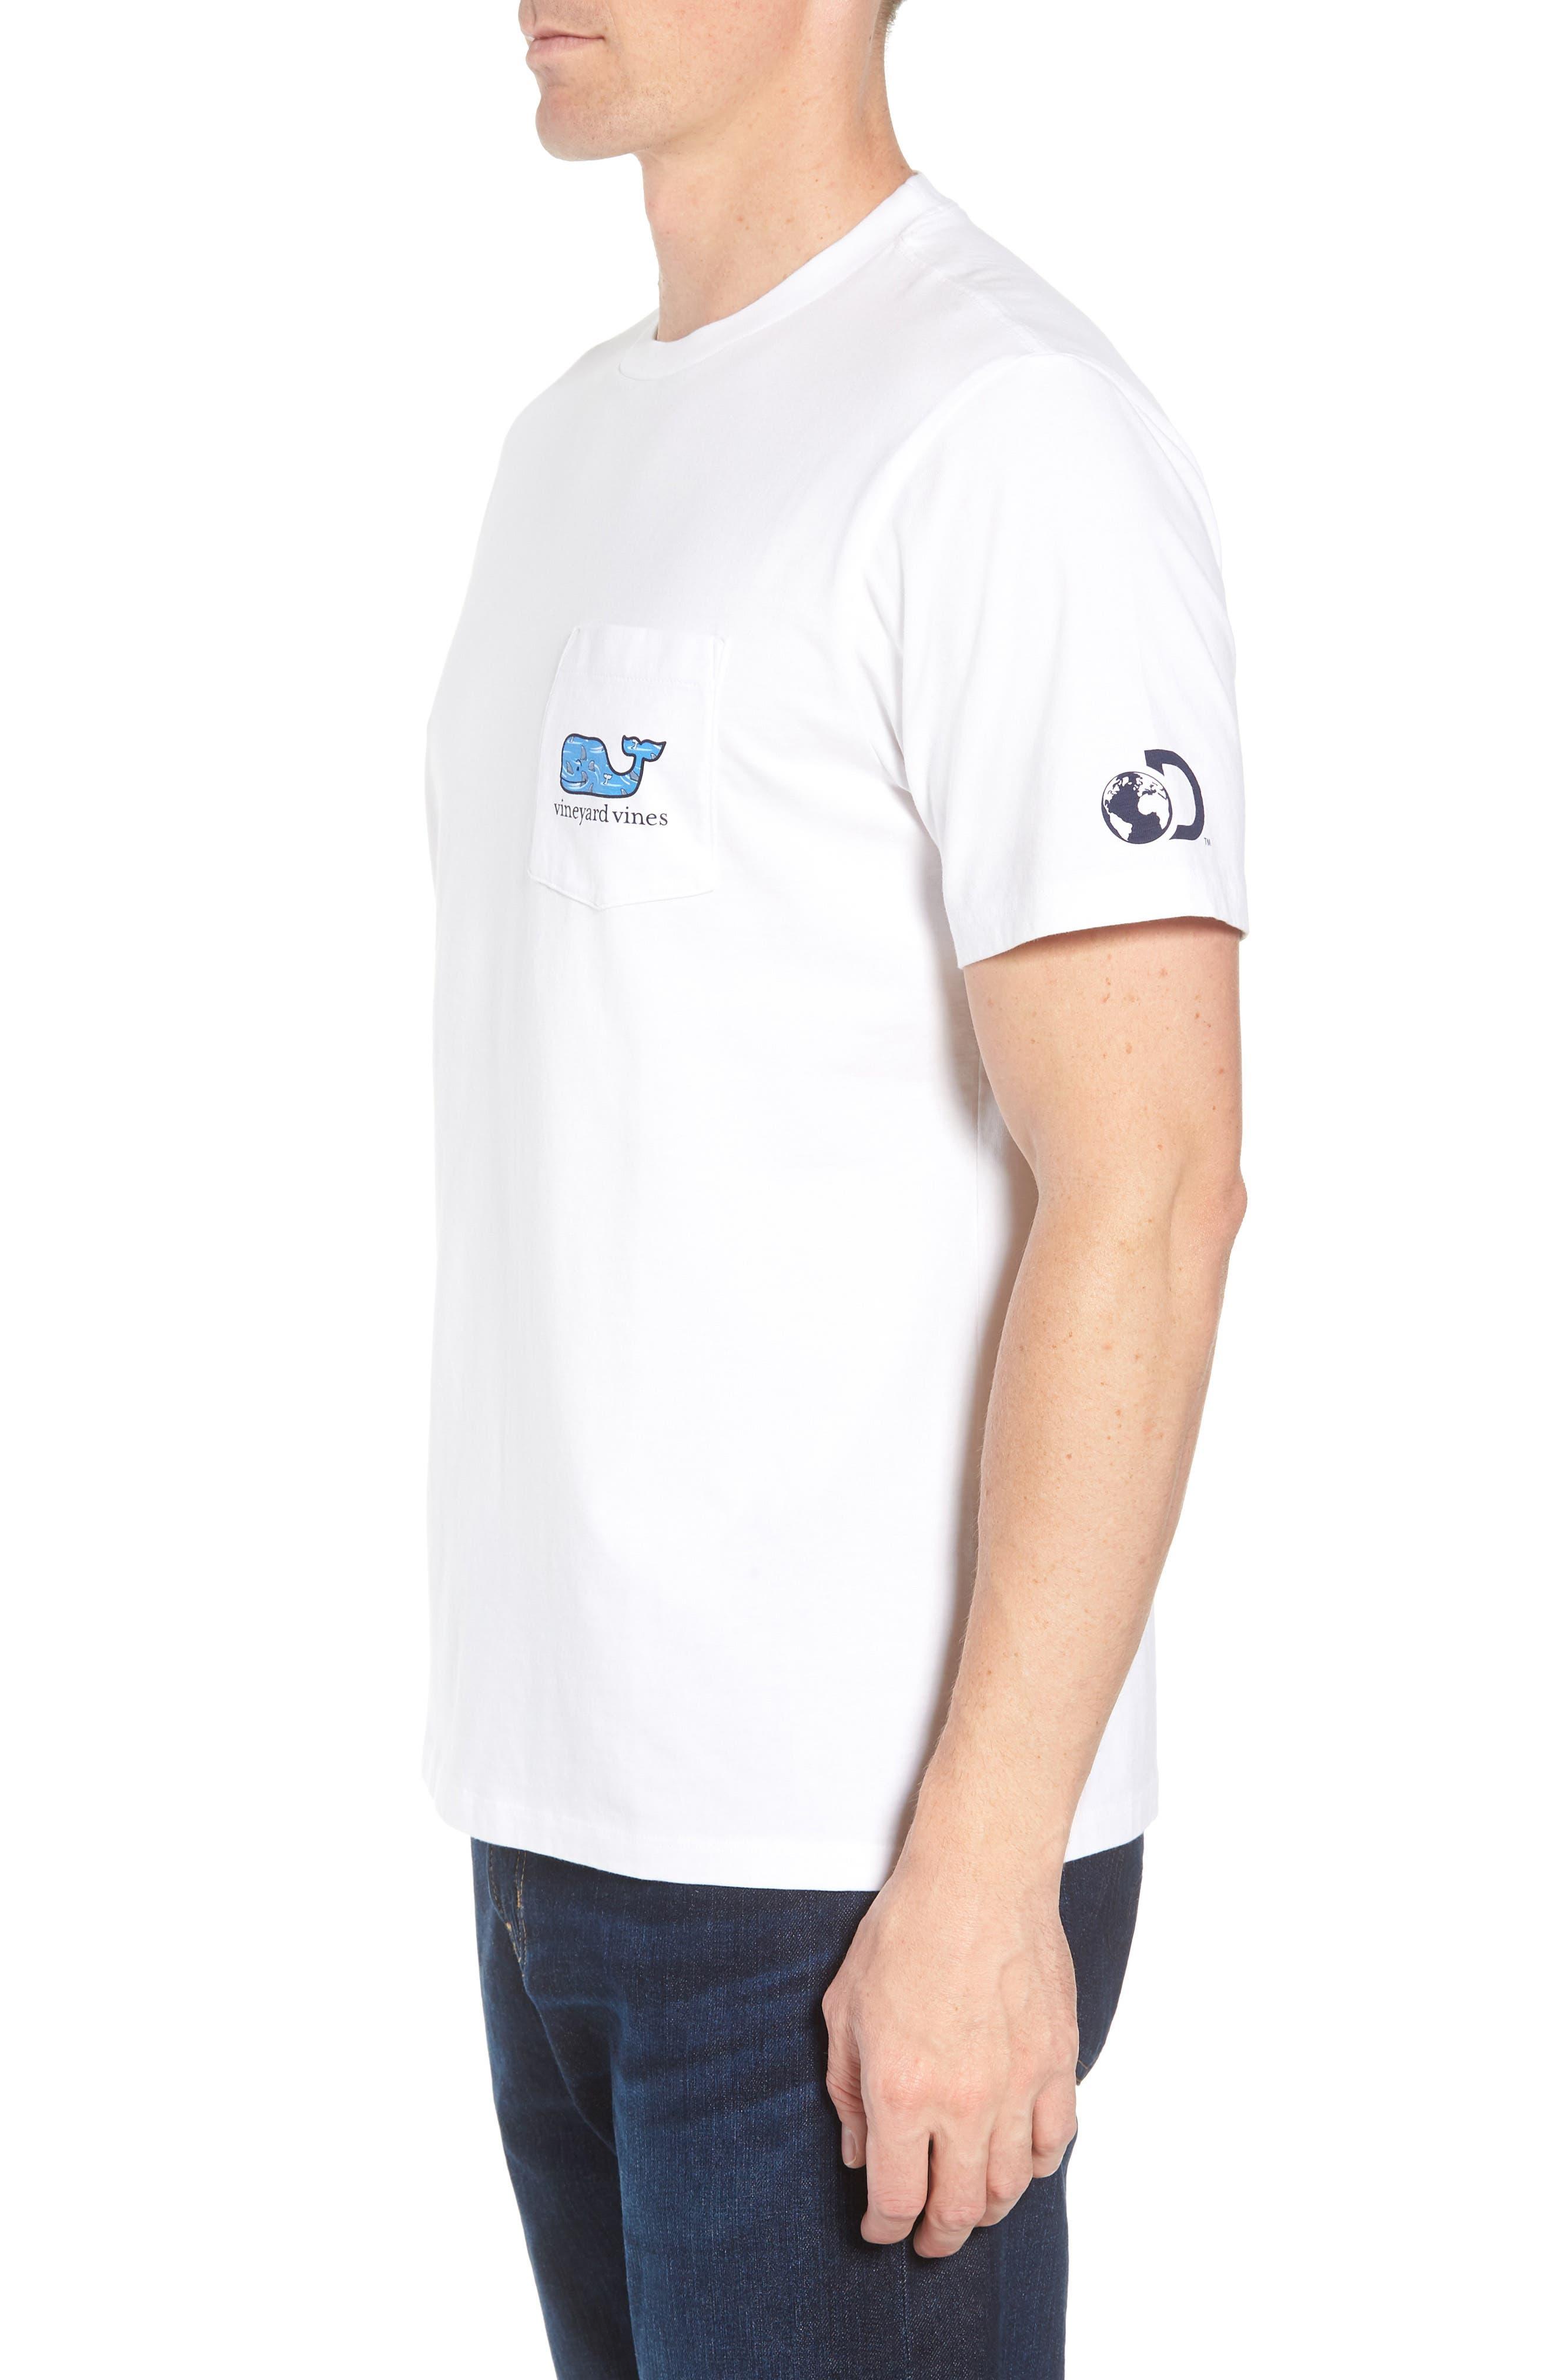 x Shark Week<sup>™</sup> Circling Sharks Pocket T-Shirt,                             Alternate thumbnail 3, color,                             White Cap